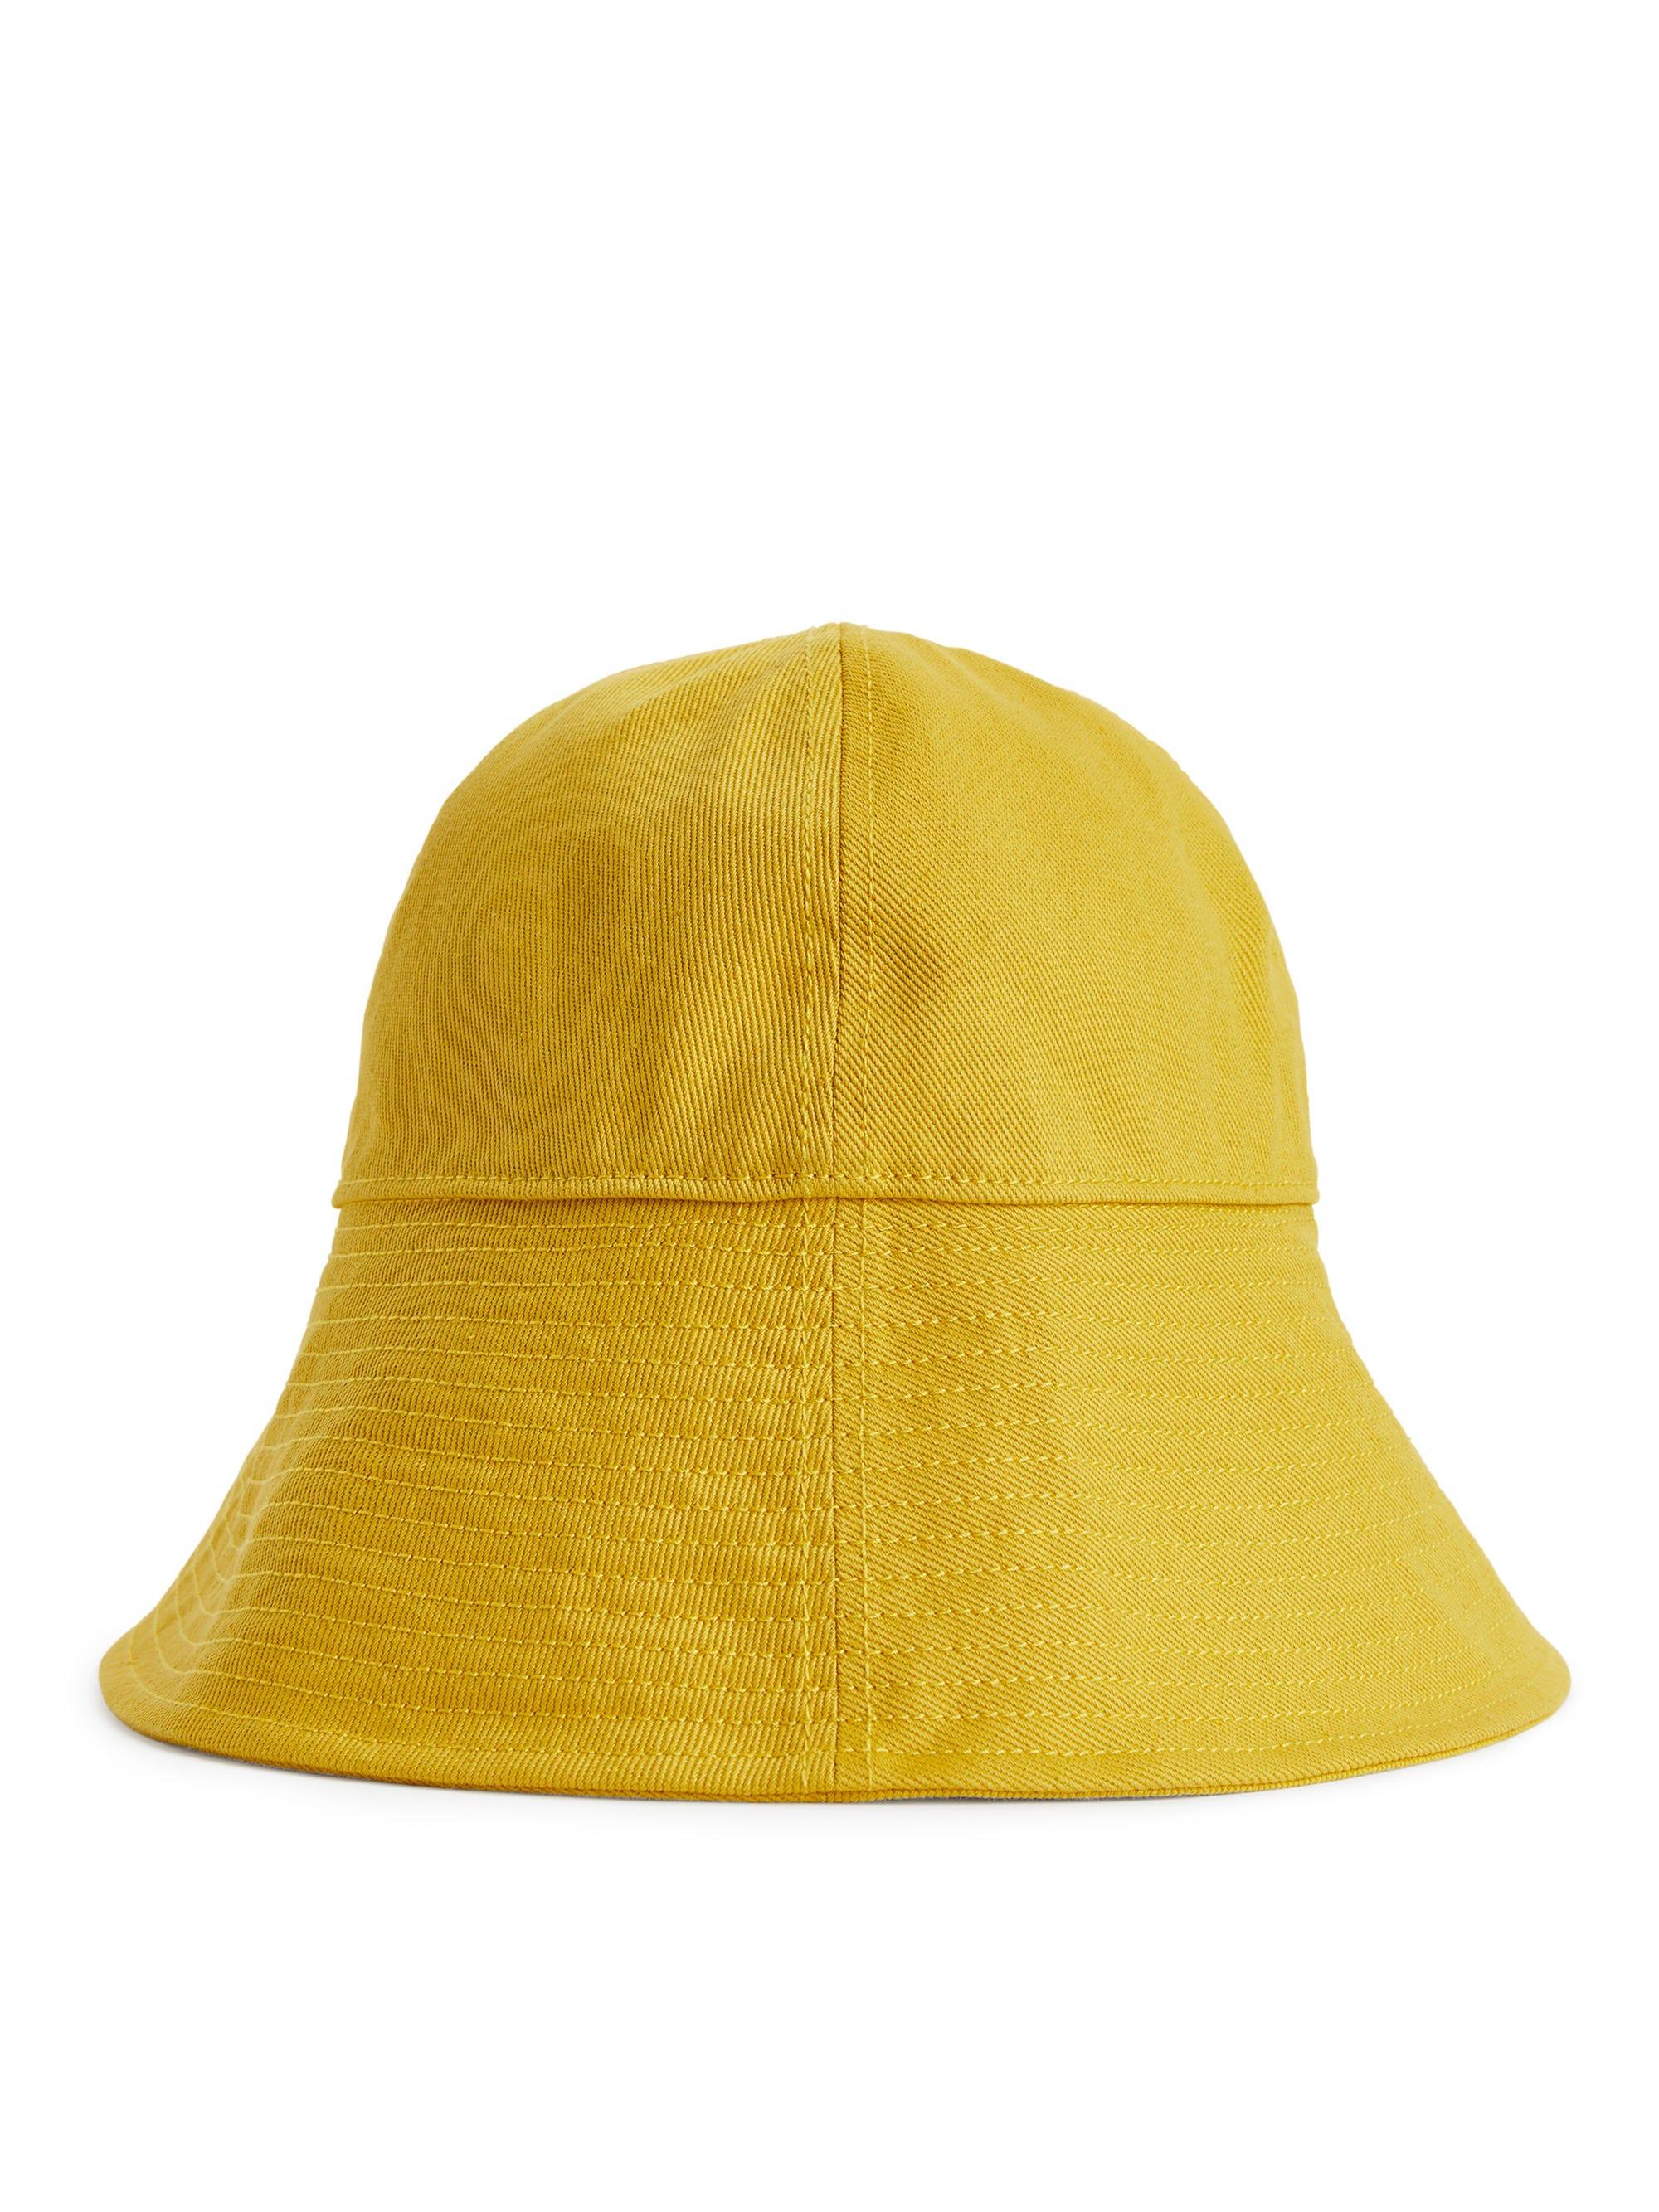 b841fcc78687 Best Summer Sun Hats For Women UK 2019